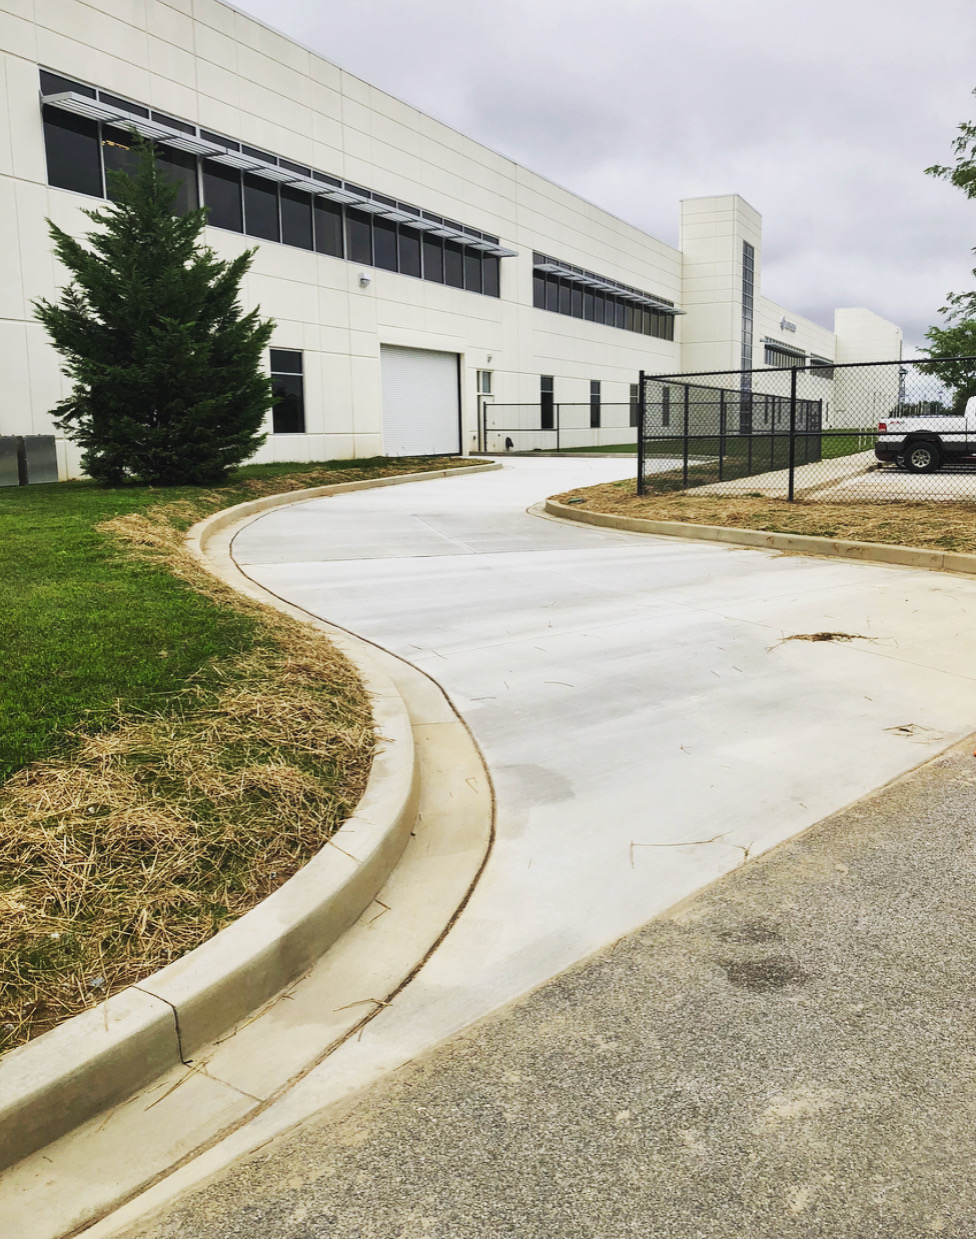 Concrete Driveway Poured